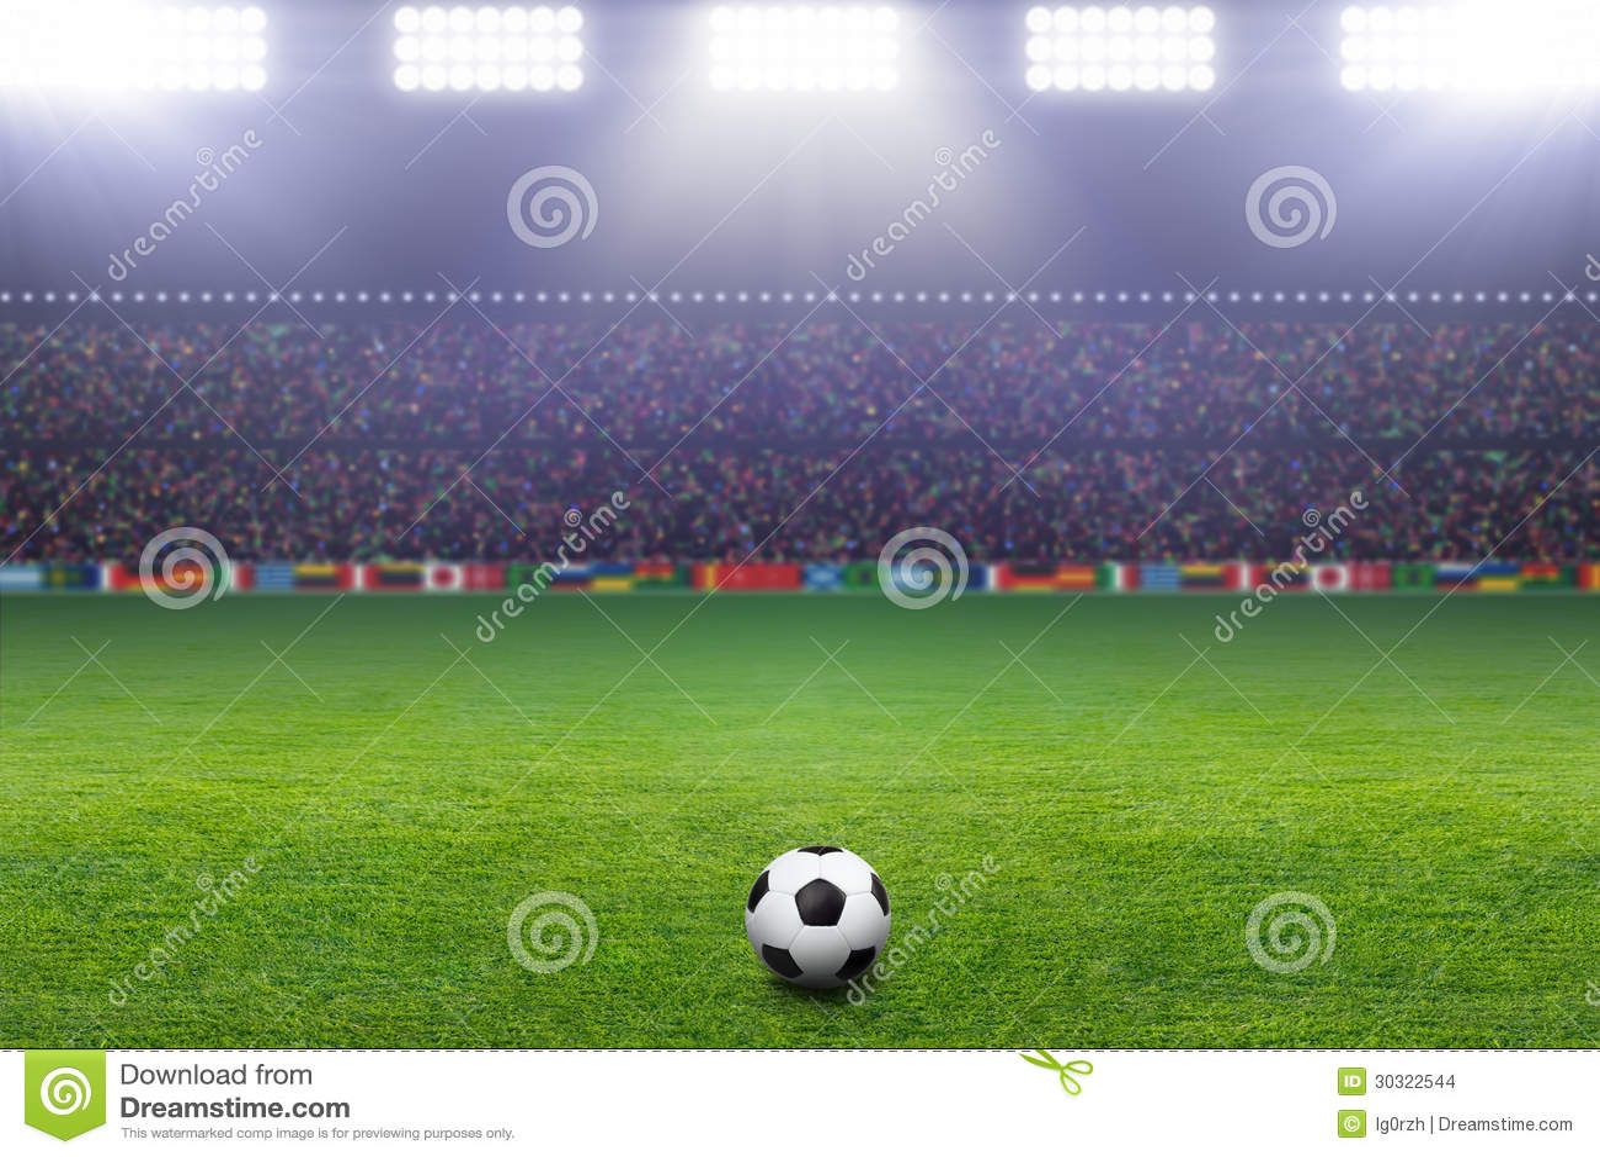 Soccer ball, stadium, light